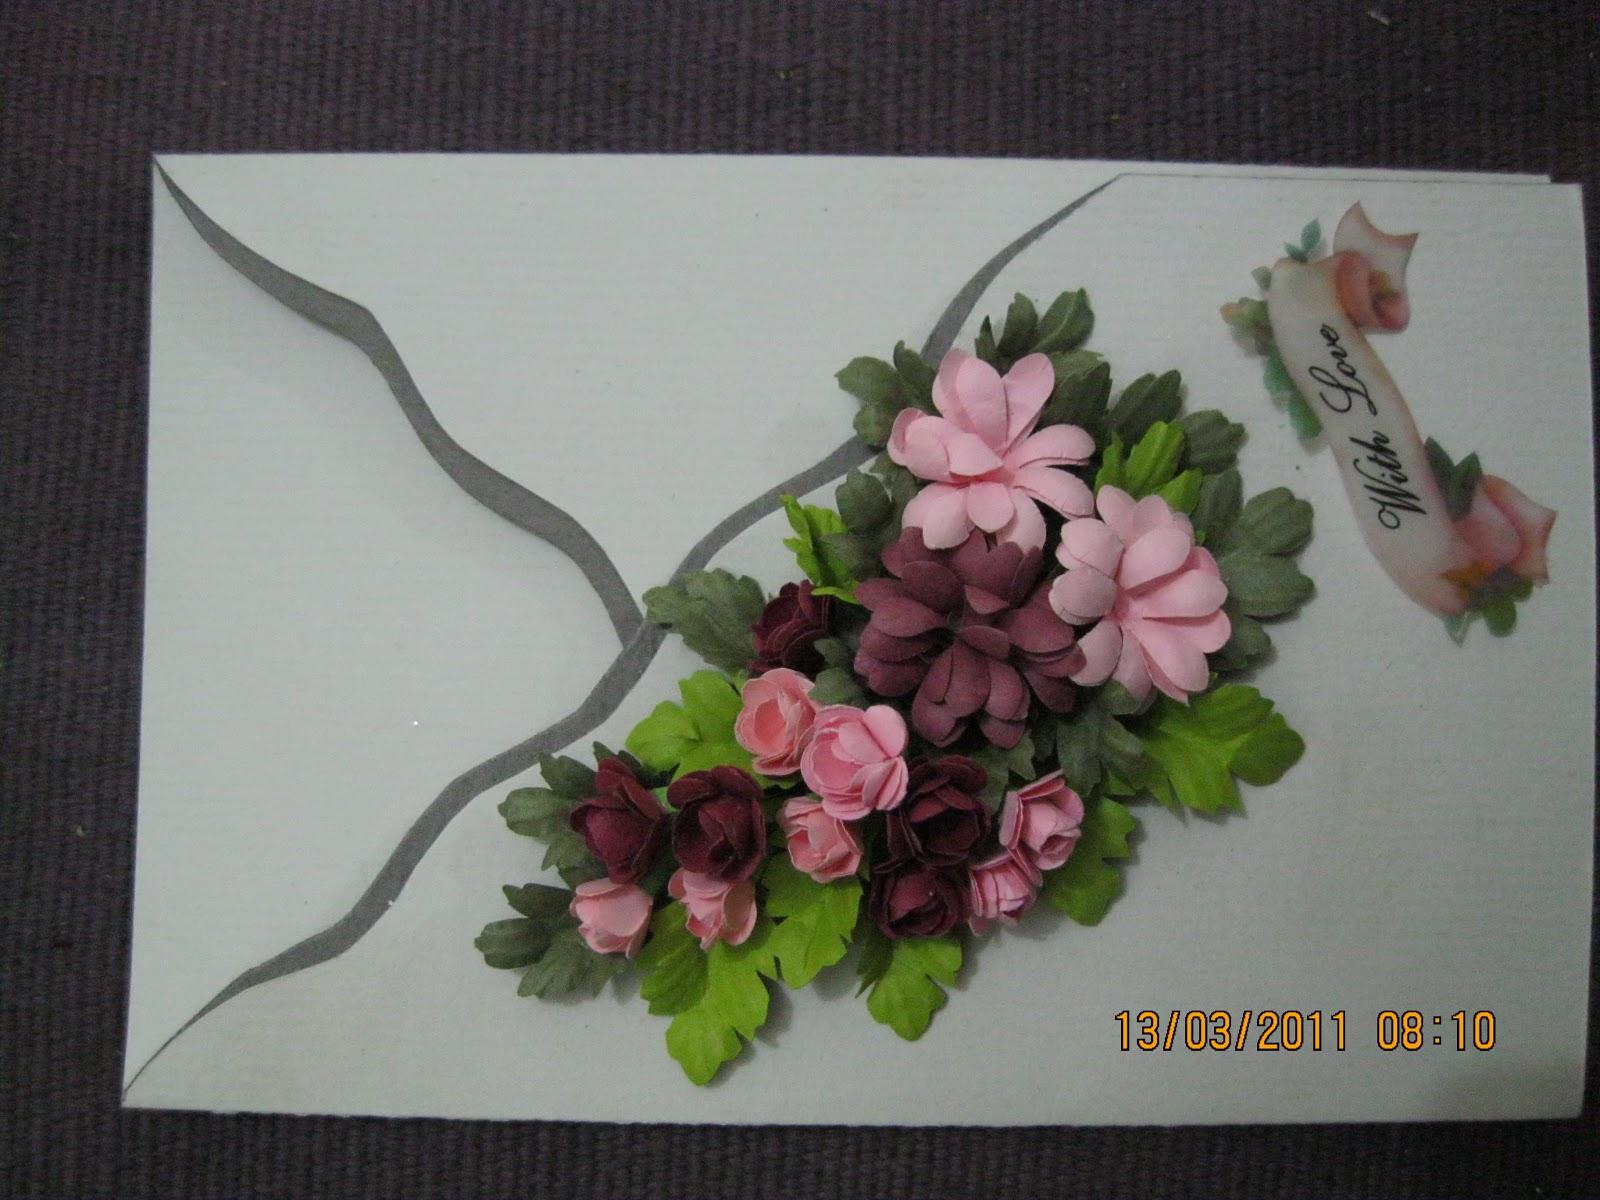 Aura craft miniature punch craft greeting cards for Image craft greeting cards